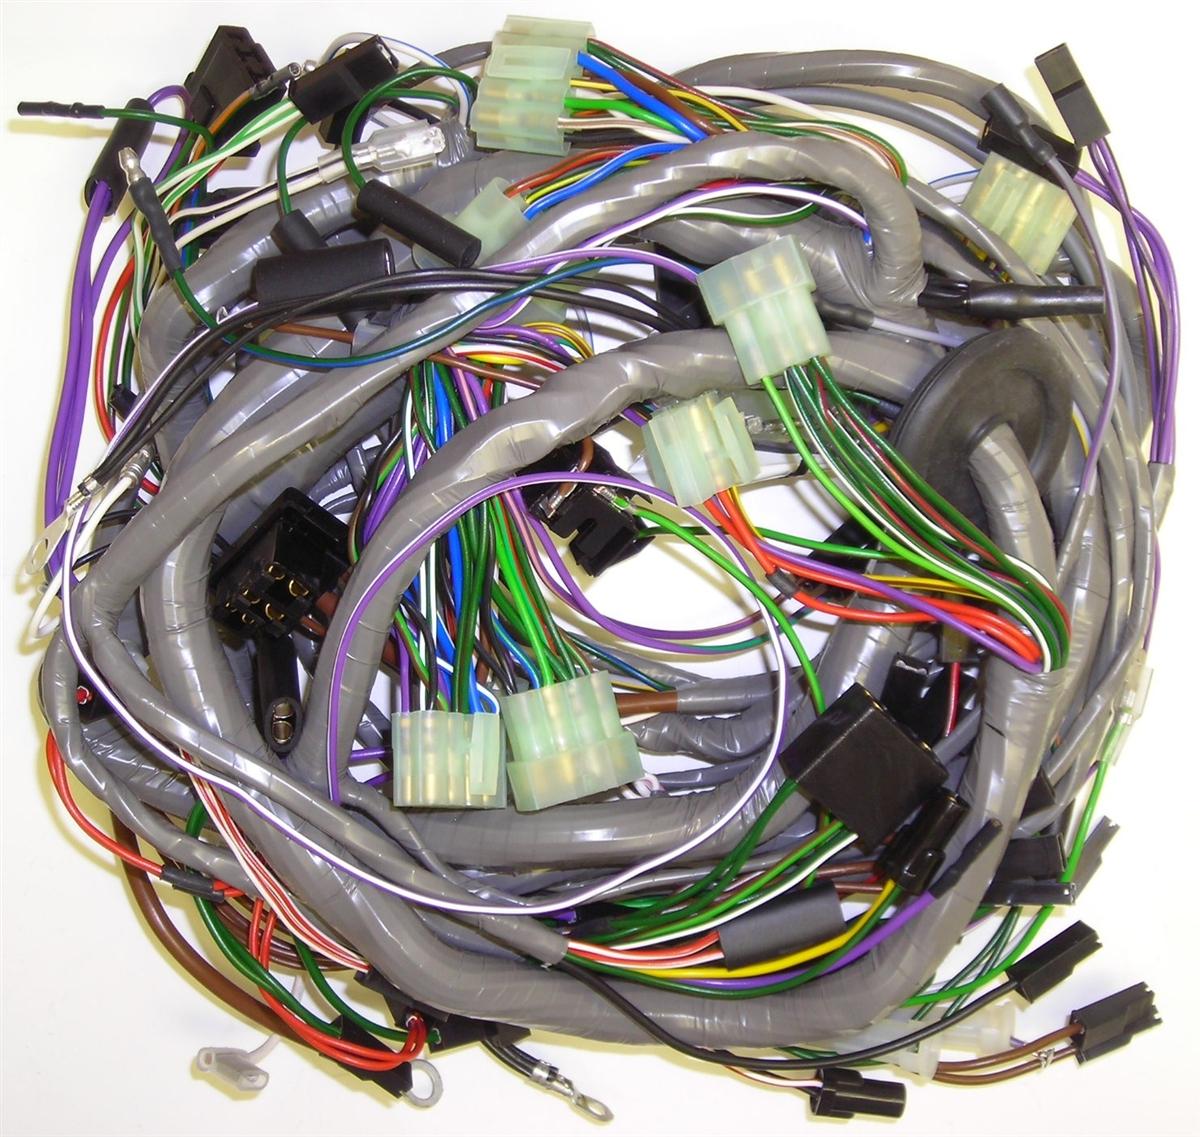 medium resolution of main wiring harness mg midget 1977 80 ca spec 1757 1977 mg midget wiring harness mg midget wiring harness